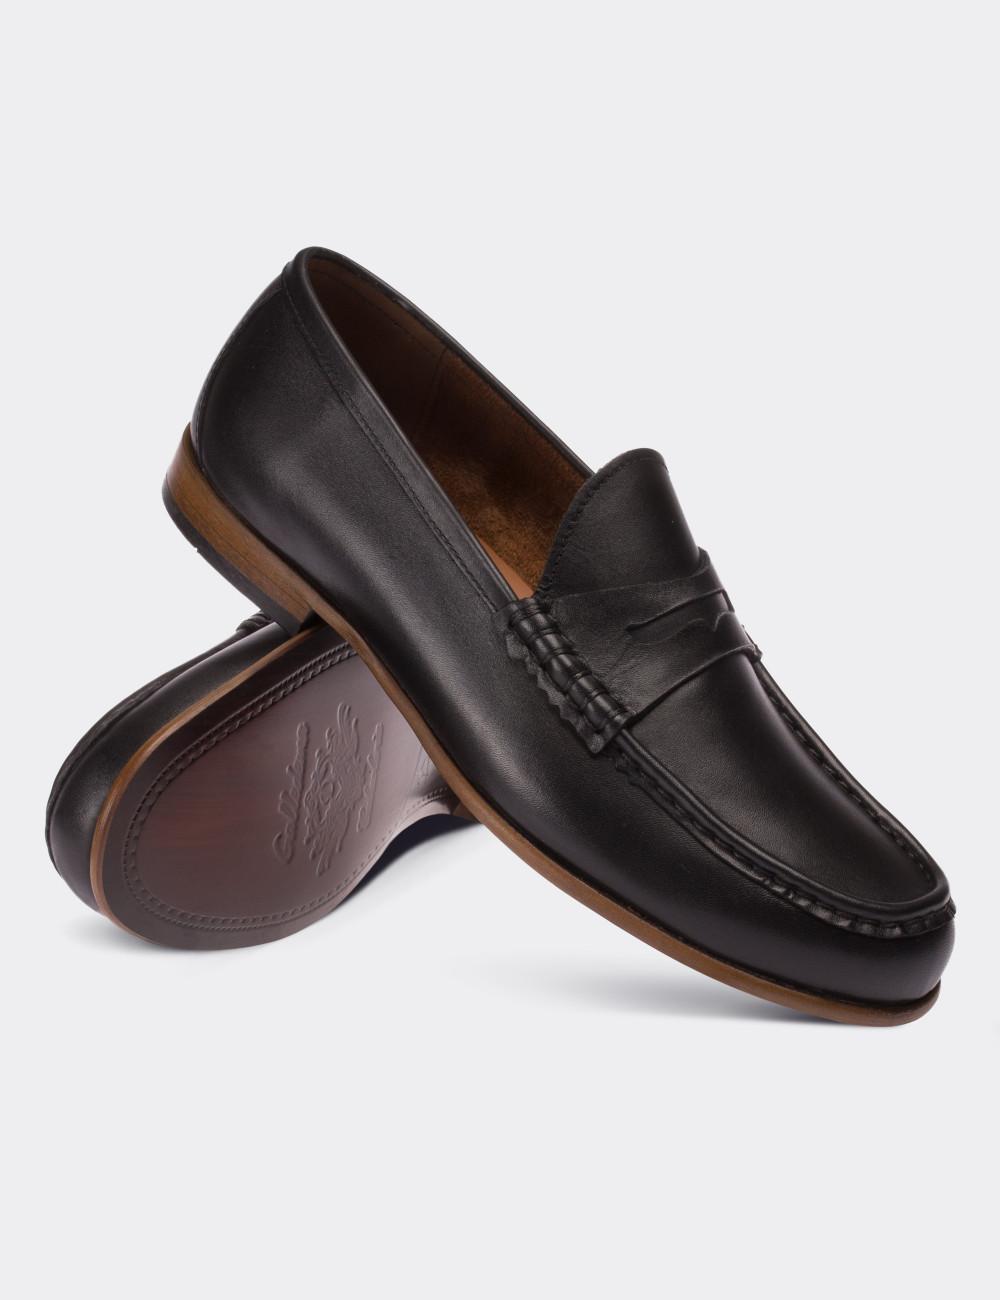 Hakiki Deri Siyah Loafer Erkek Ayakkabı - 01510MSYHM02